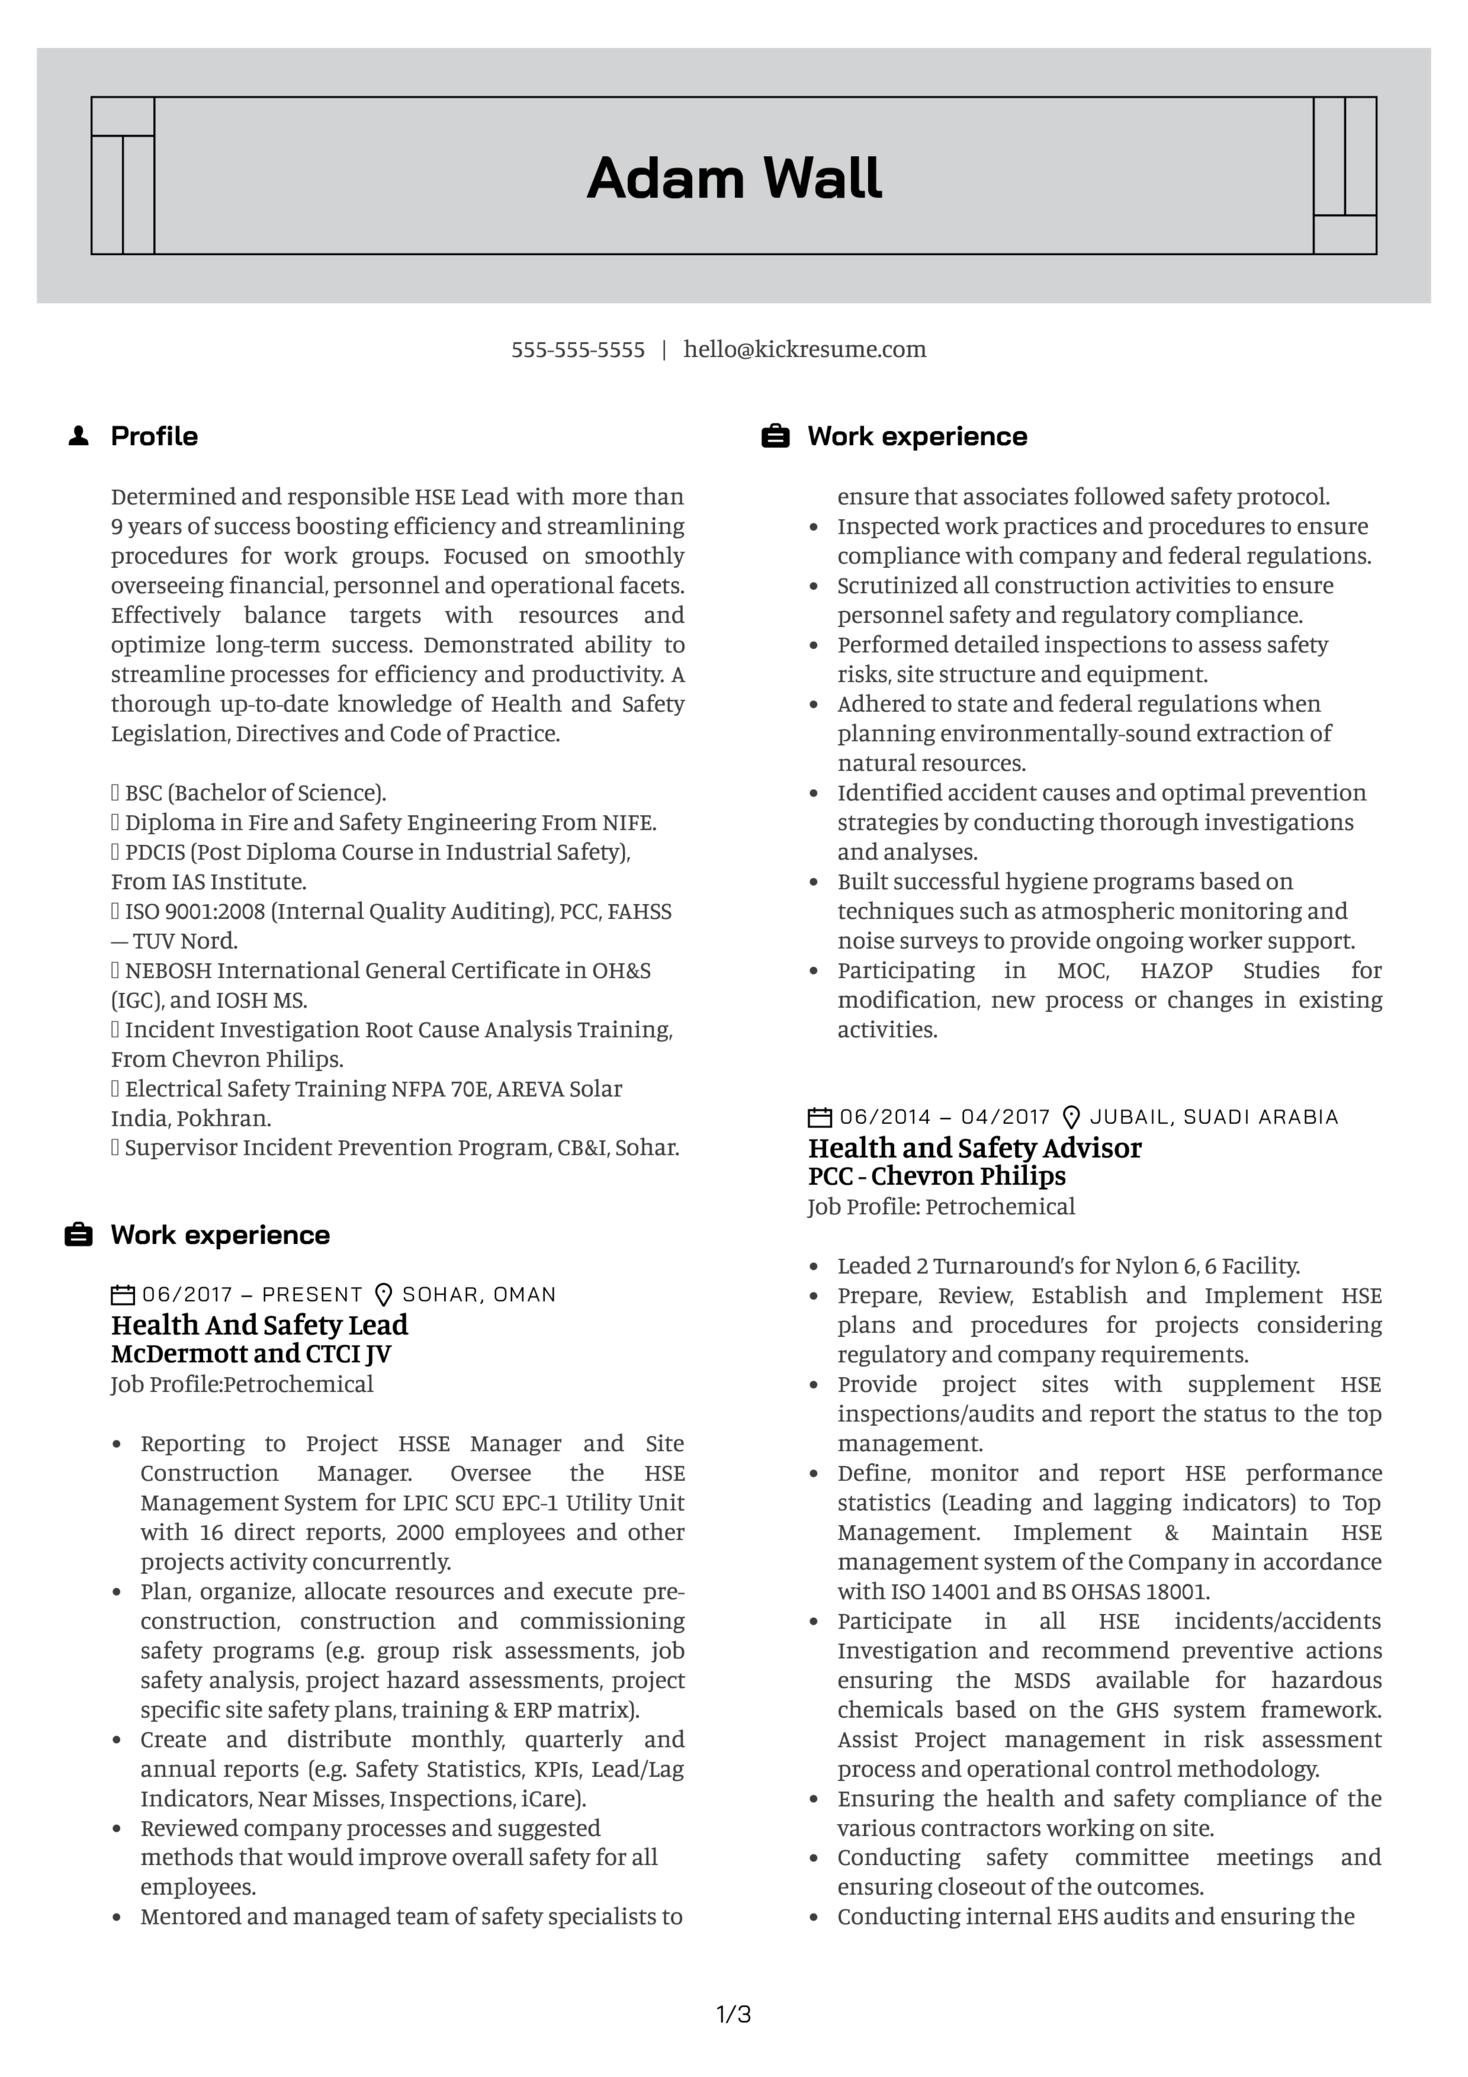 HSE Auditor Resume Sample (časť 1)